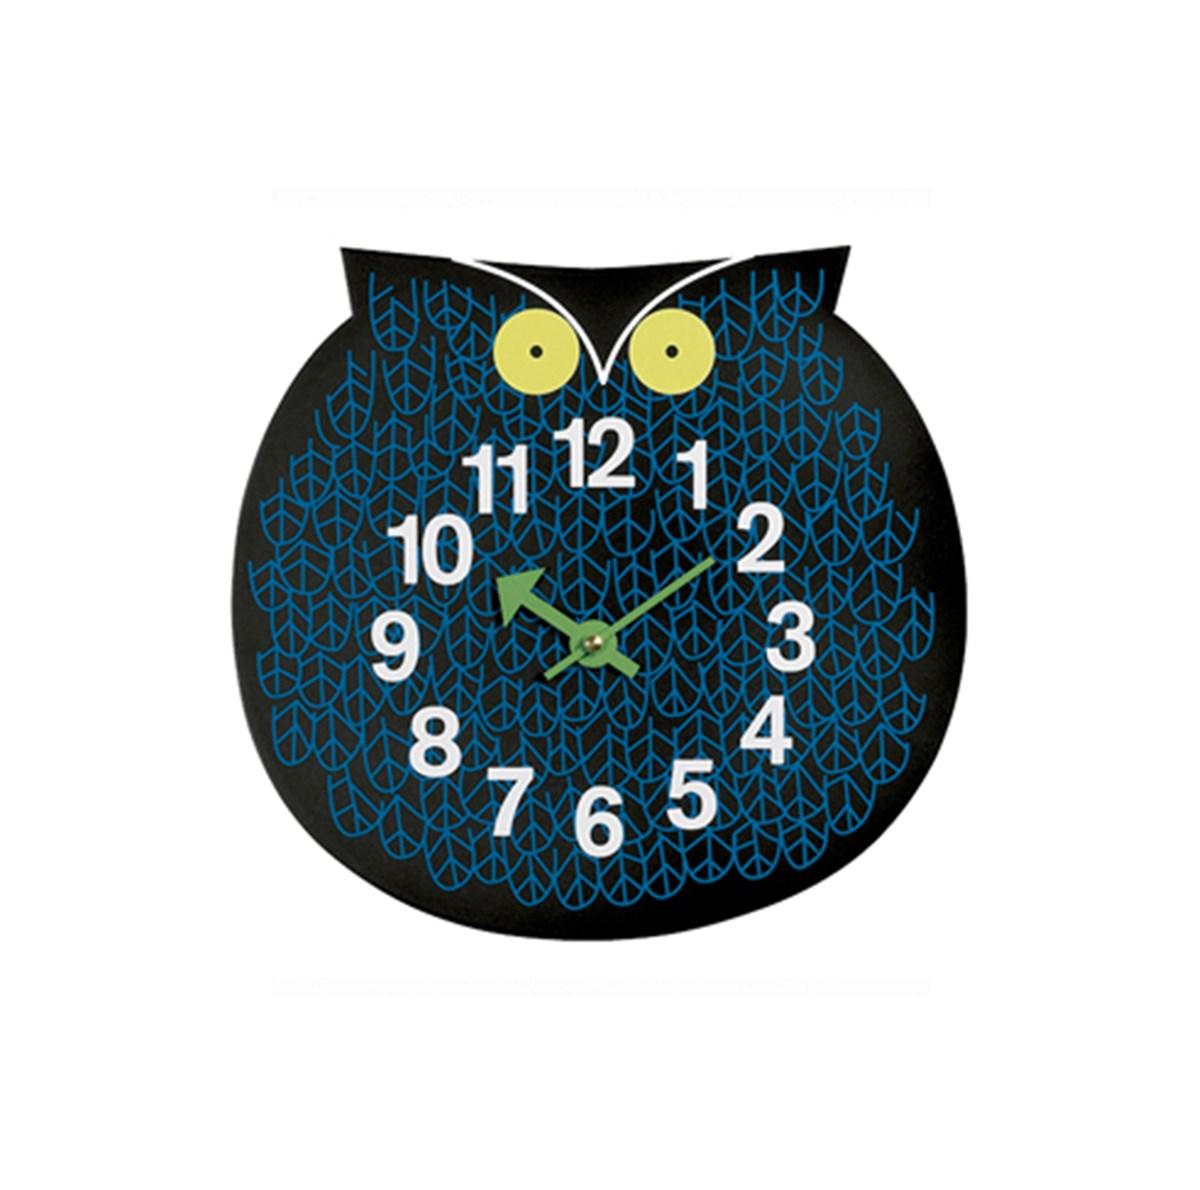 Vitra-Omar-The-Owl-Wall-Clock-Matisse-1